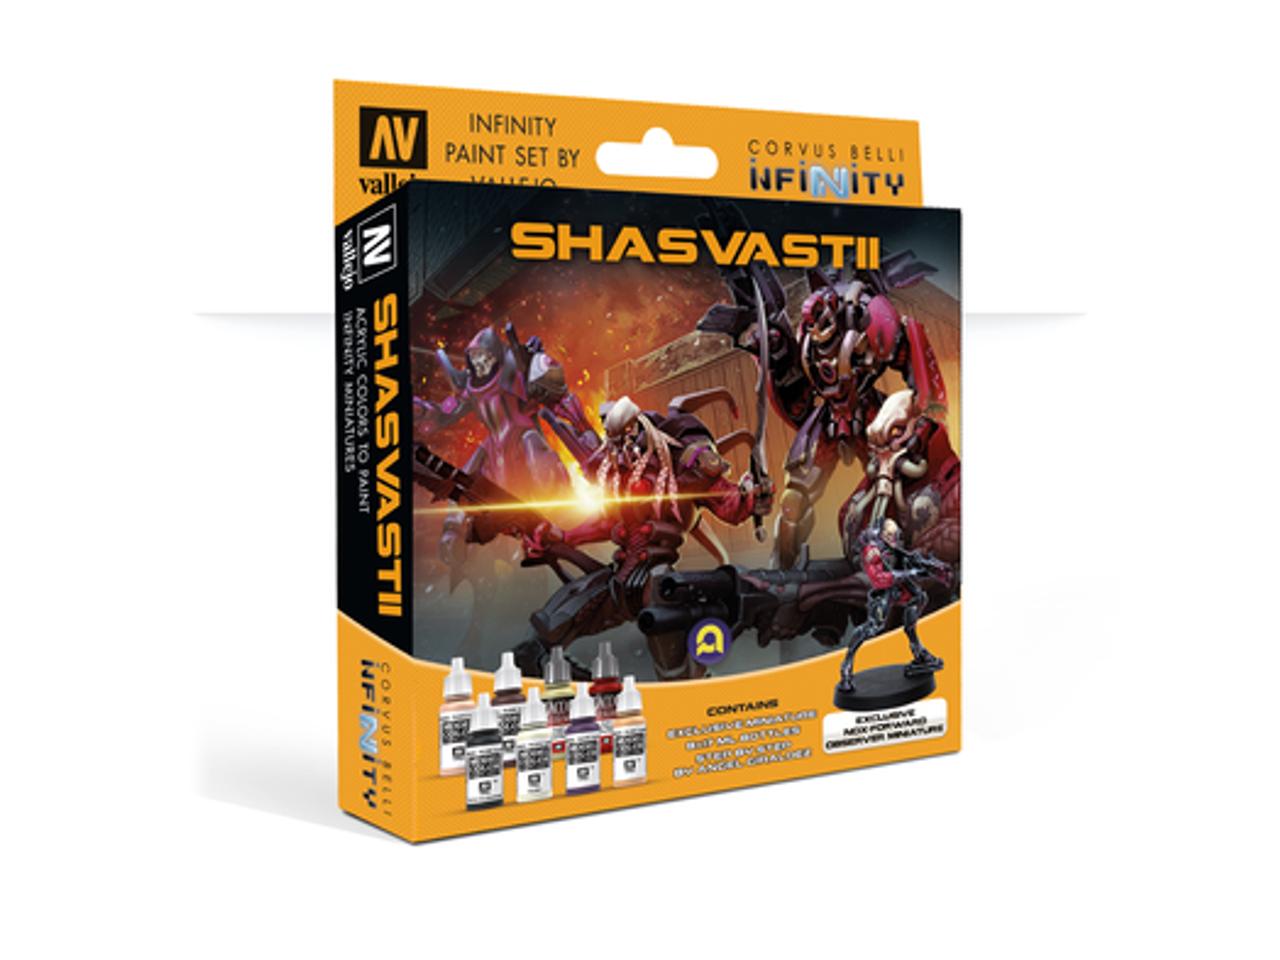 Infinity Shasvasti Model Color Set and Exclusive Mini